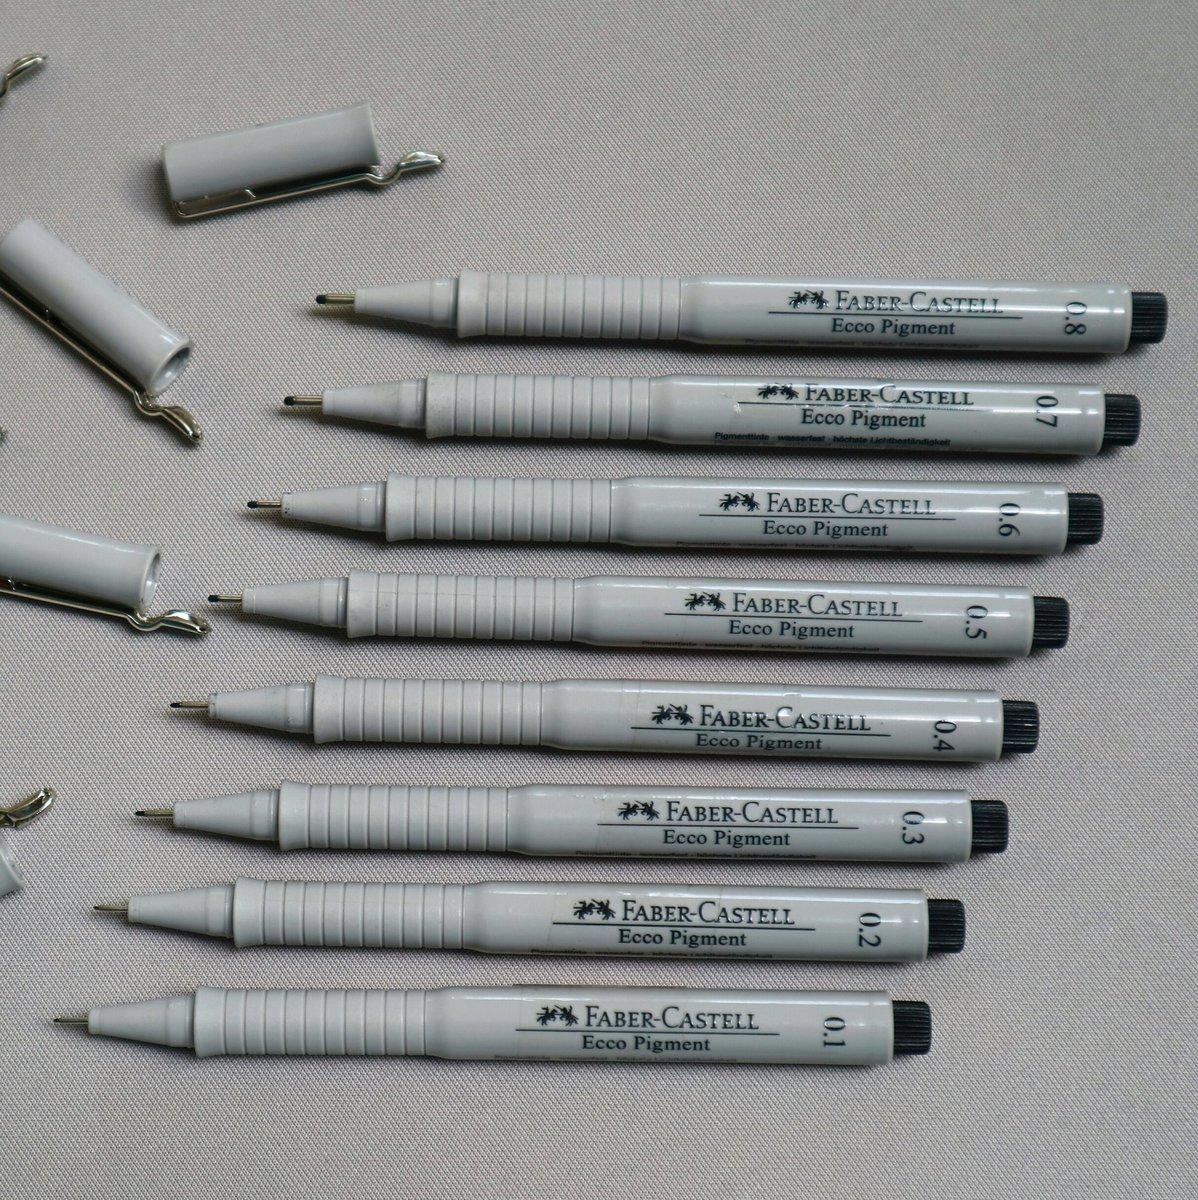 FABER-CASTELL Pigmentliner ECCO PIGMENT 0,7 mm schwarz